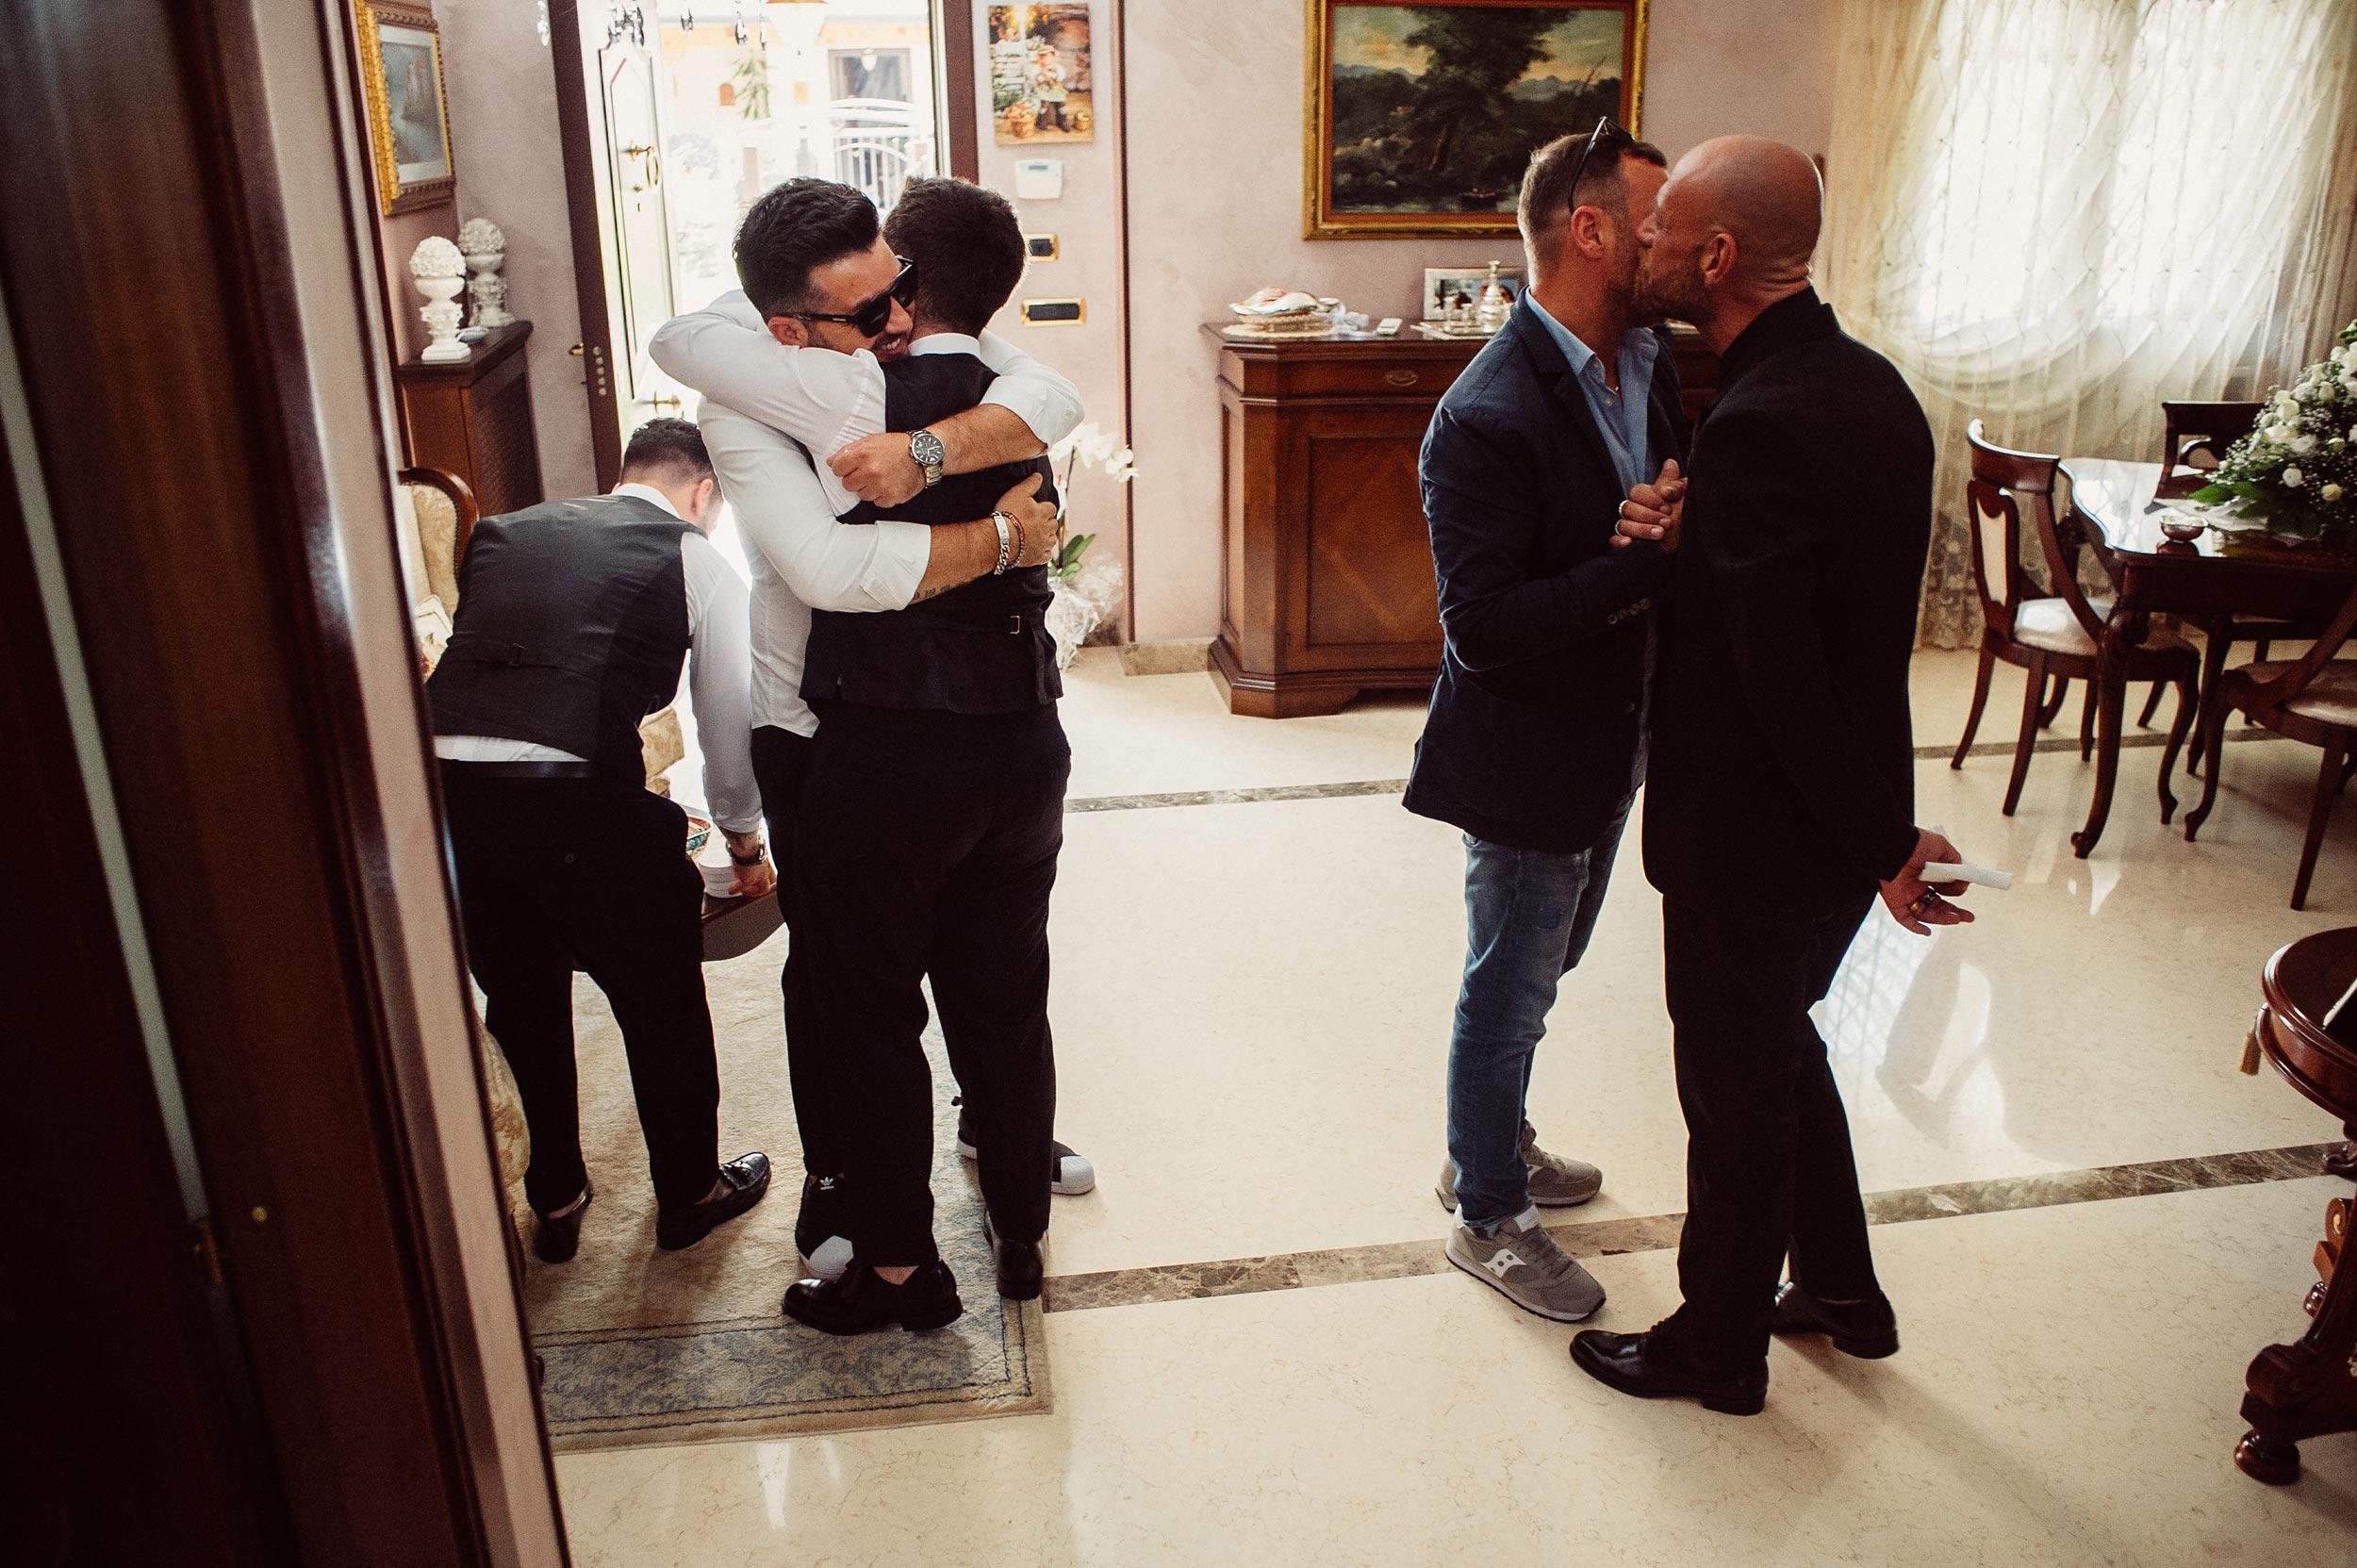 2016-Claudio-Teresa-Naples-Wedding-Photographer-Italy-Alessandro-Avenali-9.jpg